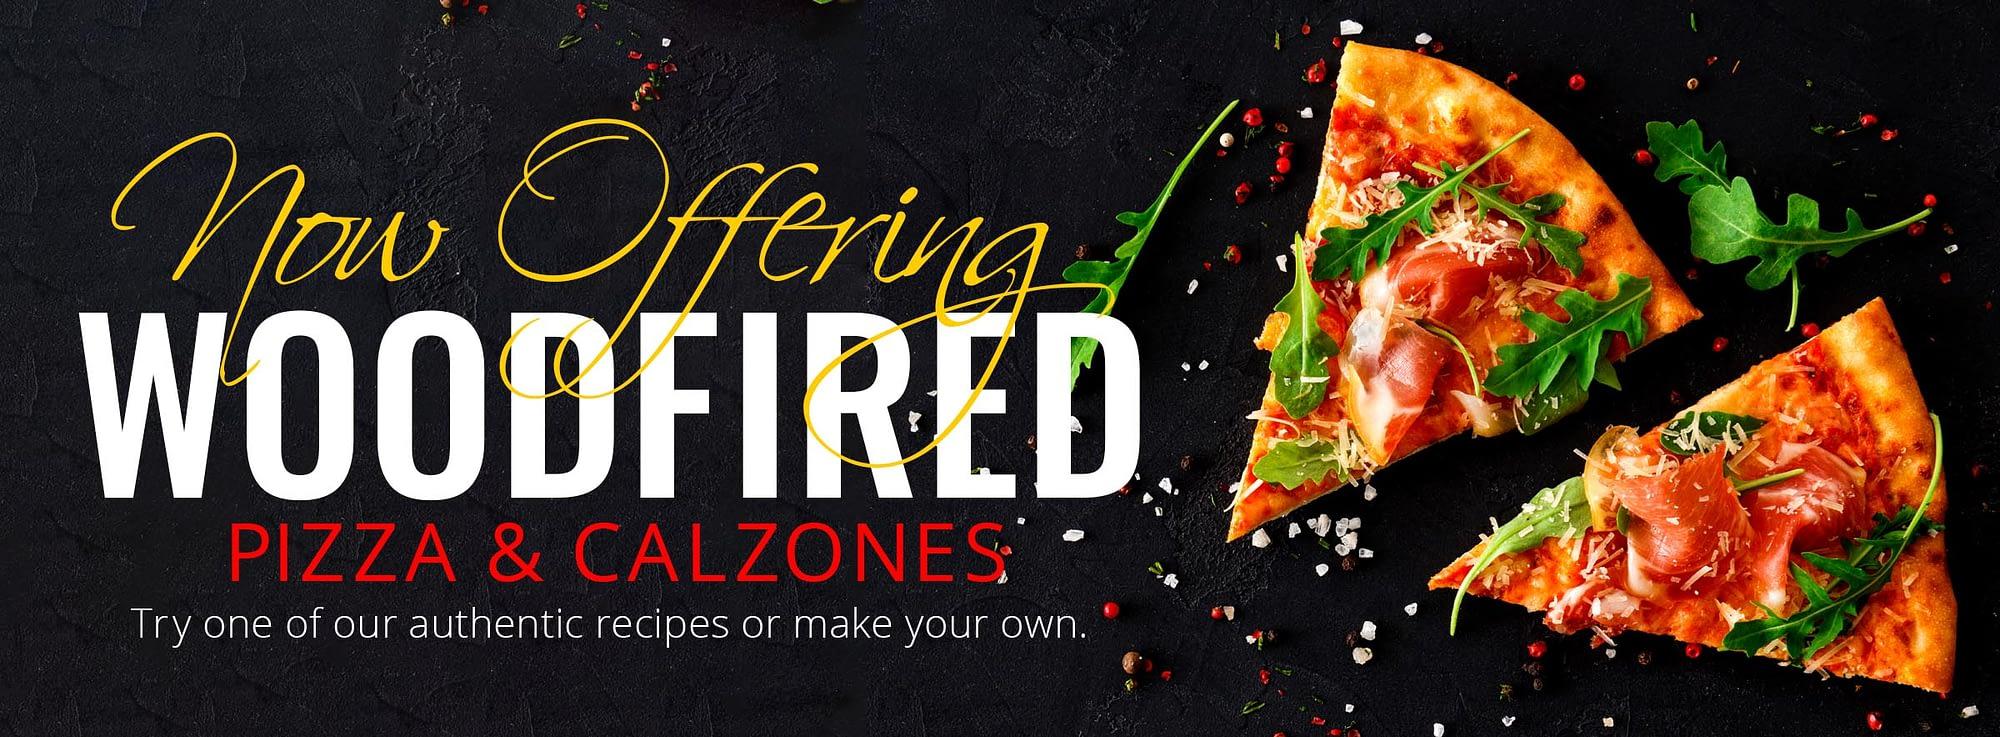 WoodFired Pizza Boca Raton